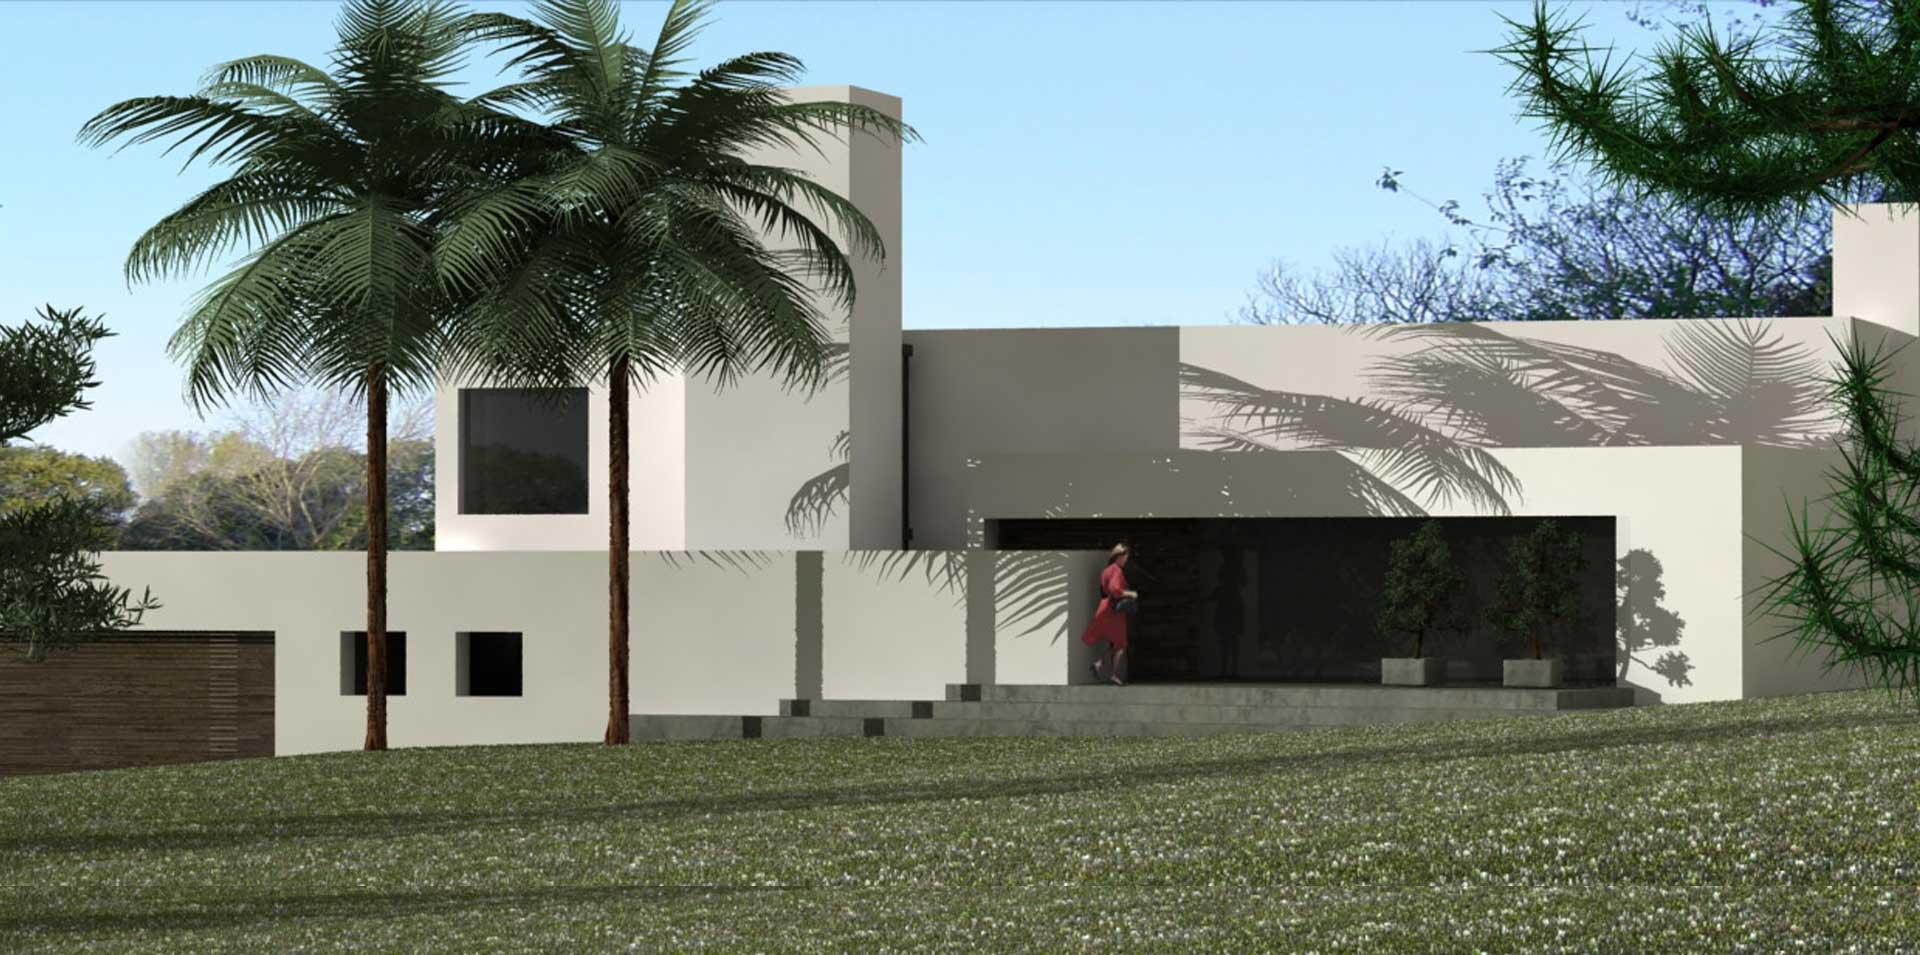 Lfl arquitectos estudio de arquitectura en cordoba - Estudios de arquitectura en cordoba ...